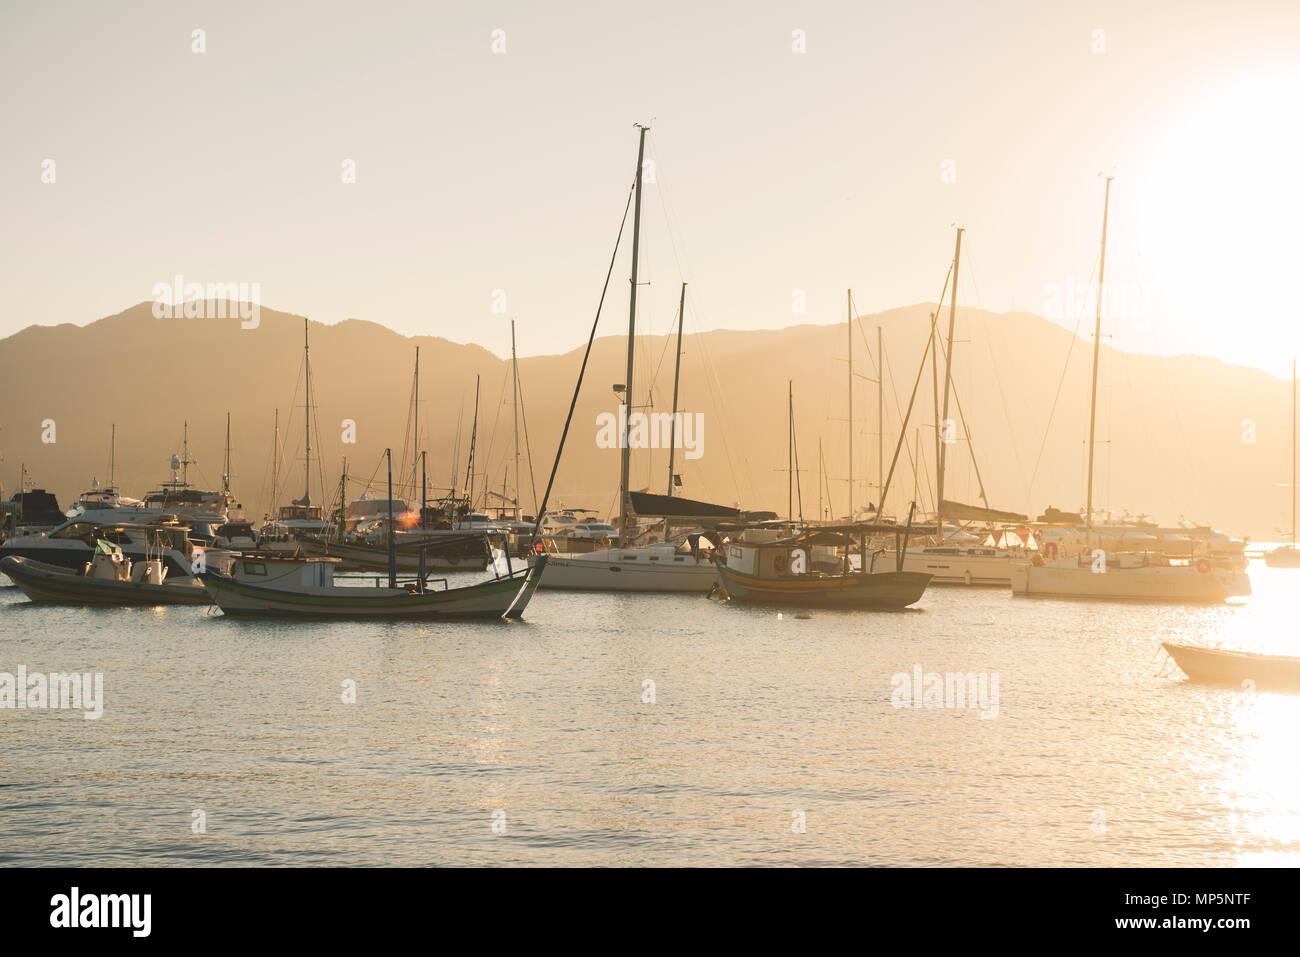 Sail boats moored at Ilhabela, SE Brazil - Stock Image